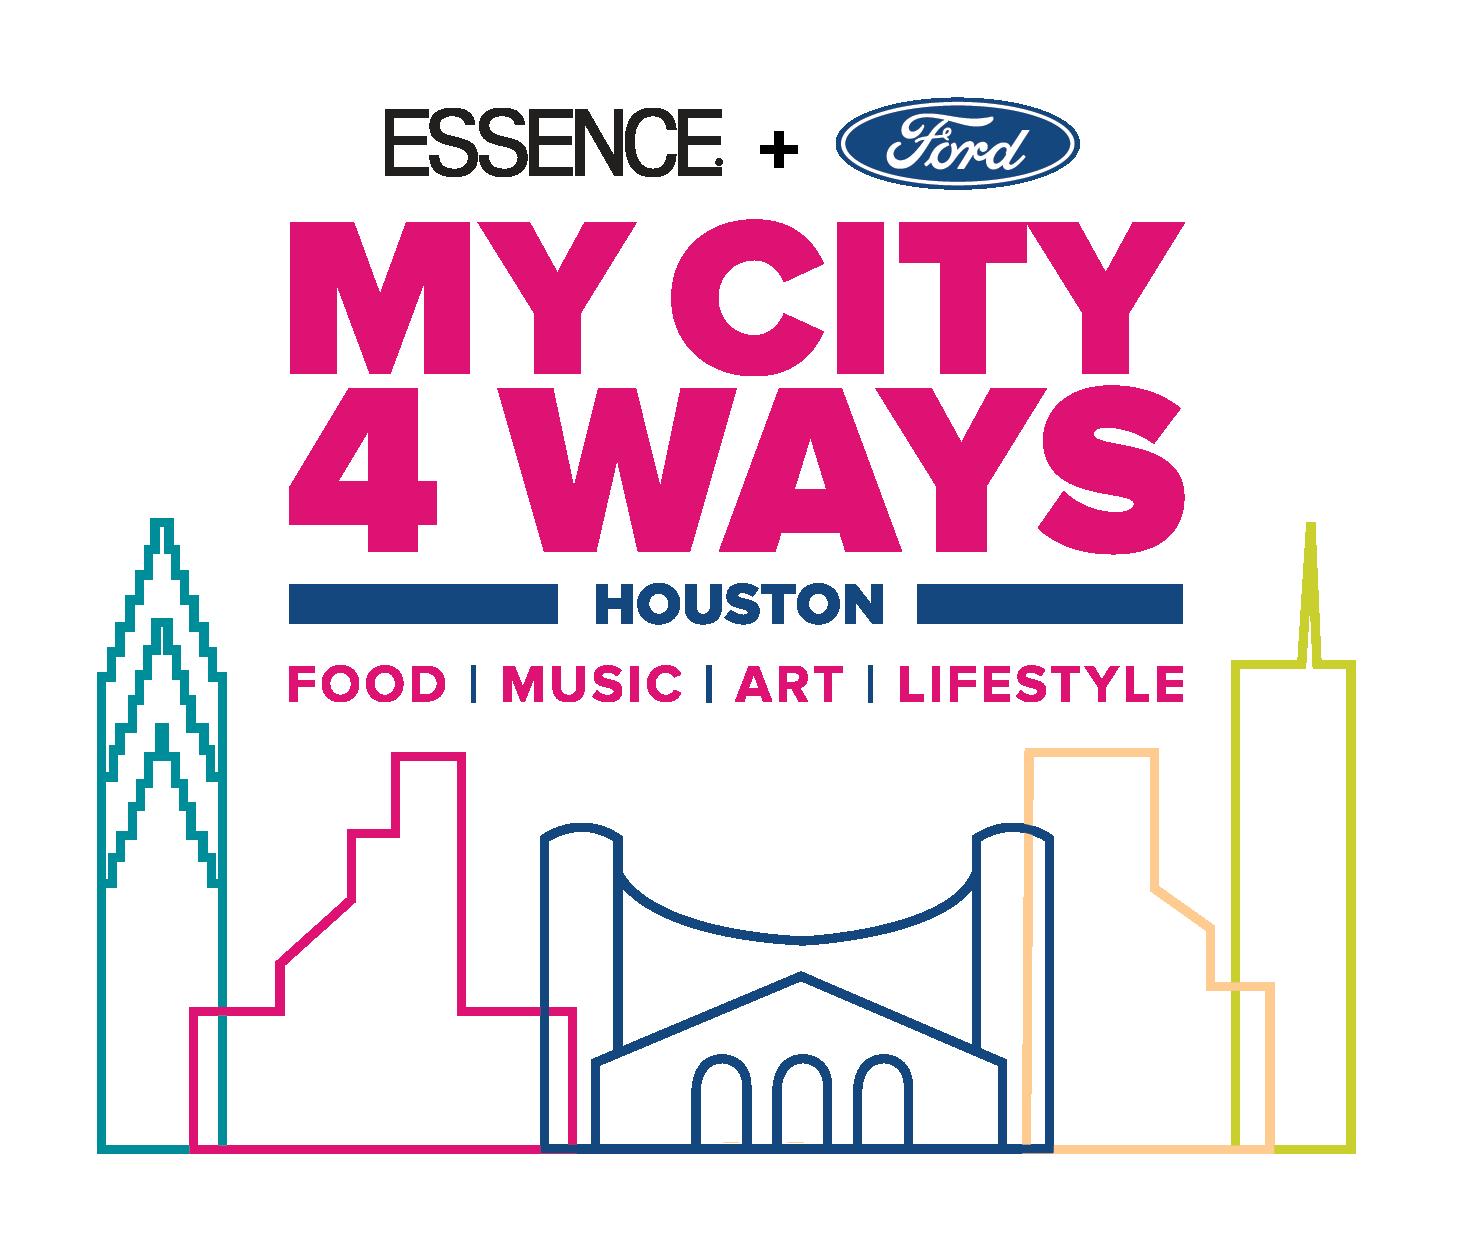 My City 4 Ways Houston